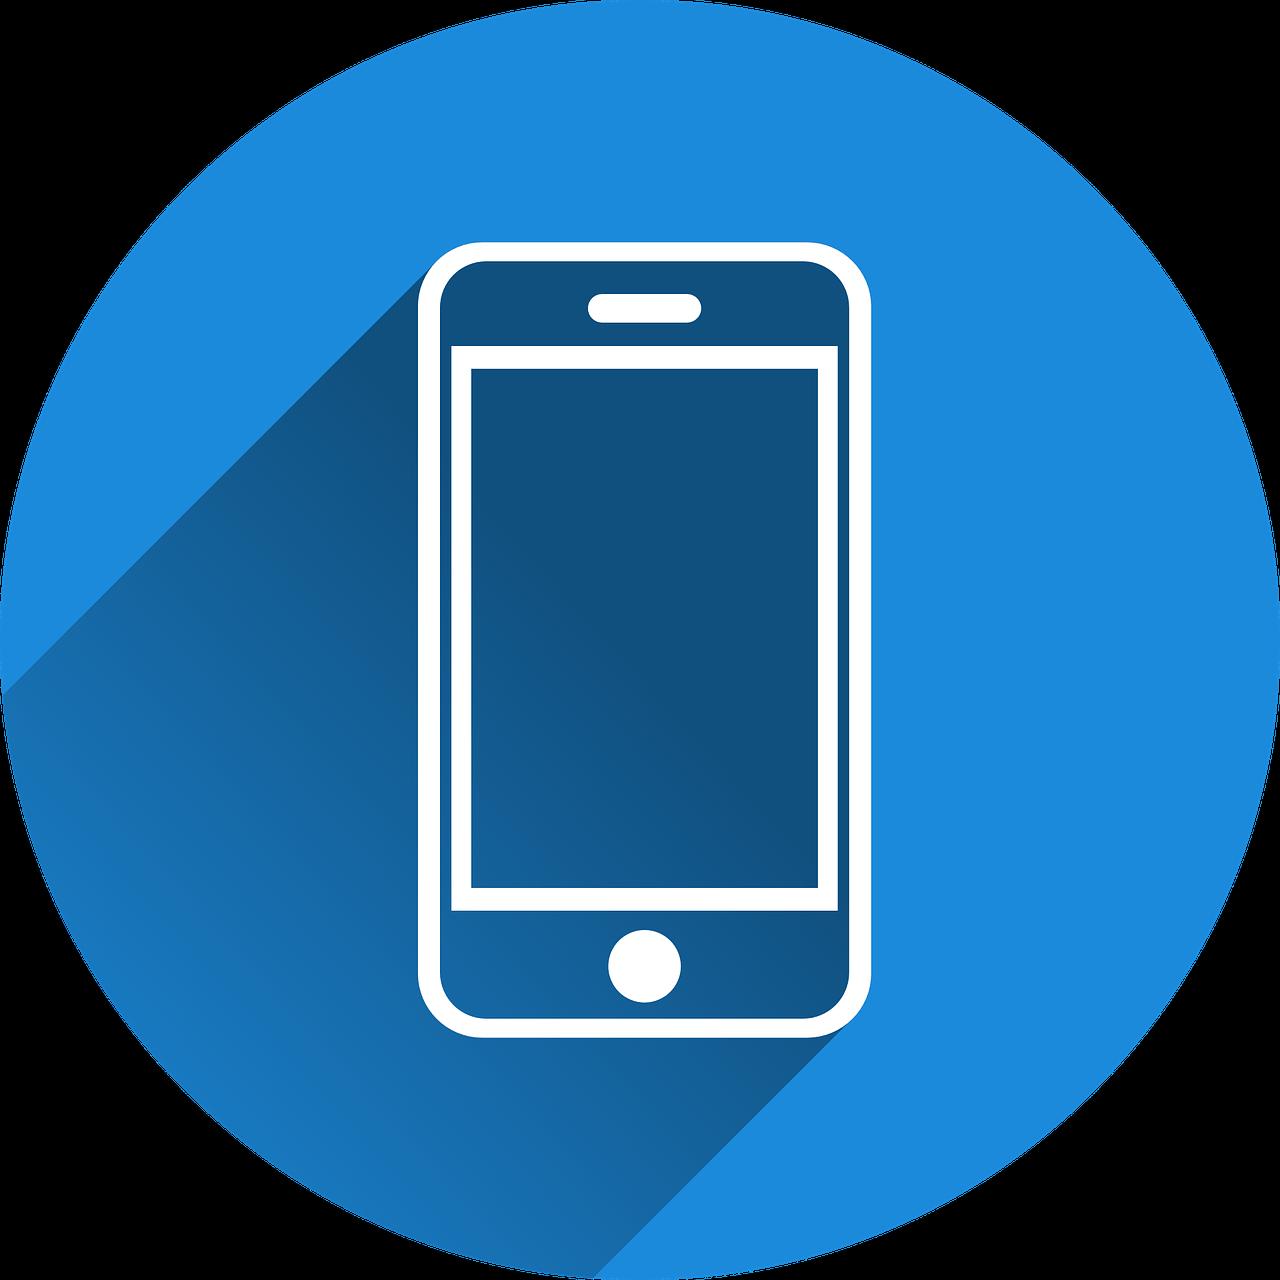 smartphone, mobile phone, phone-1132677.jpg